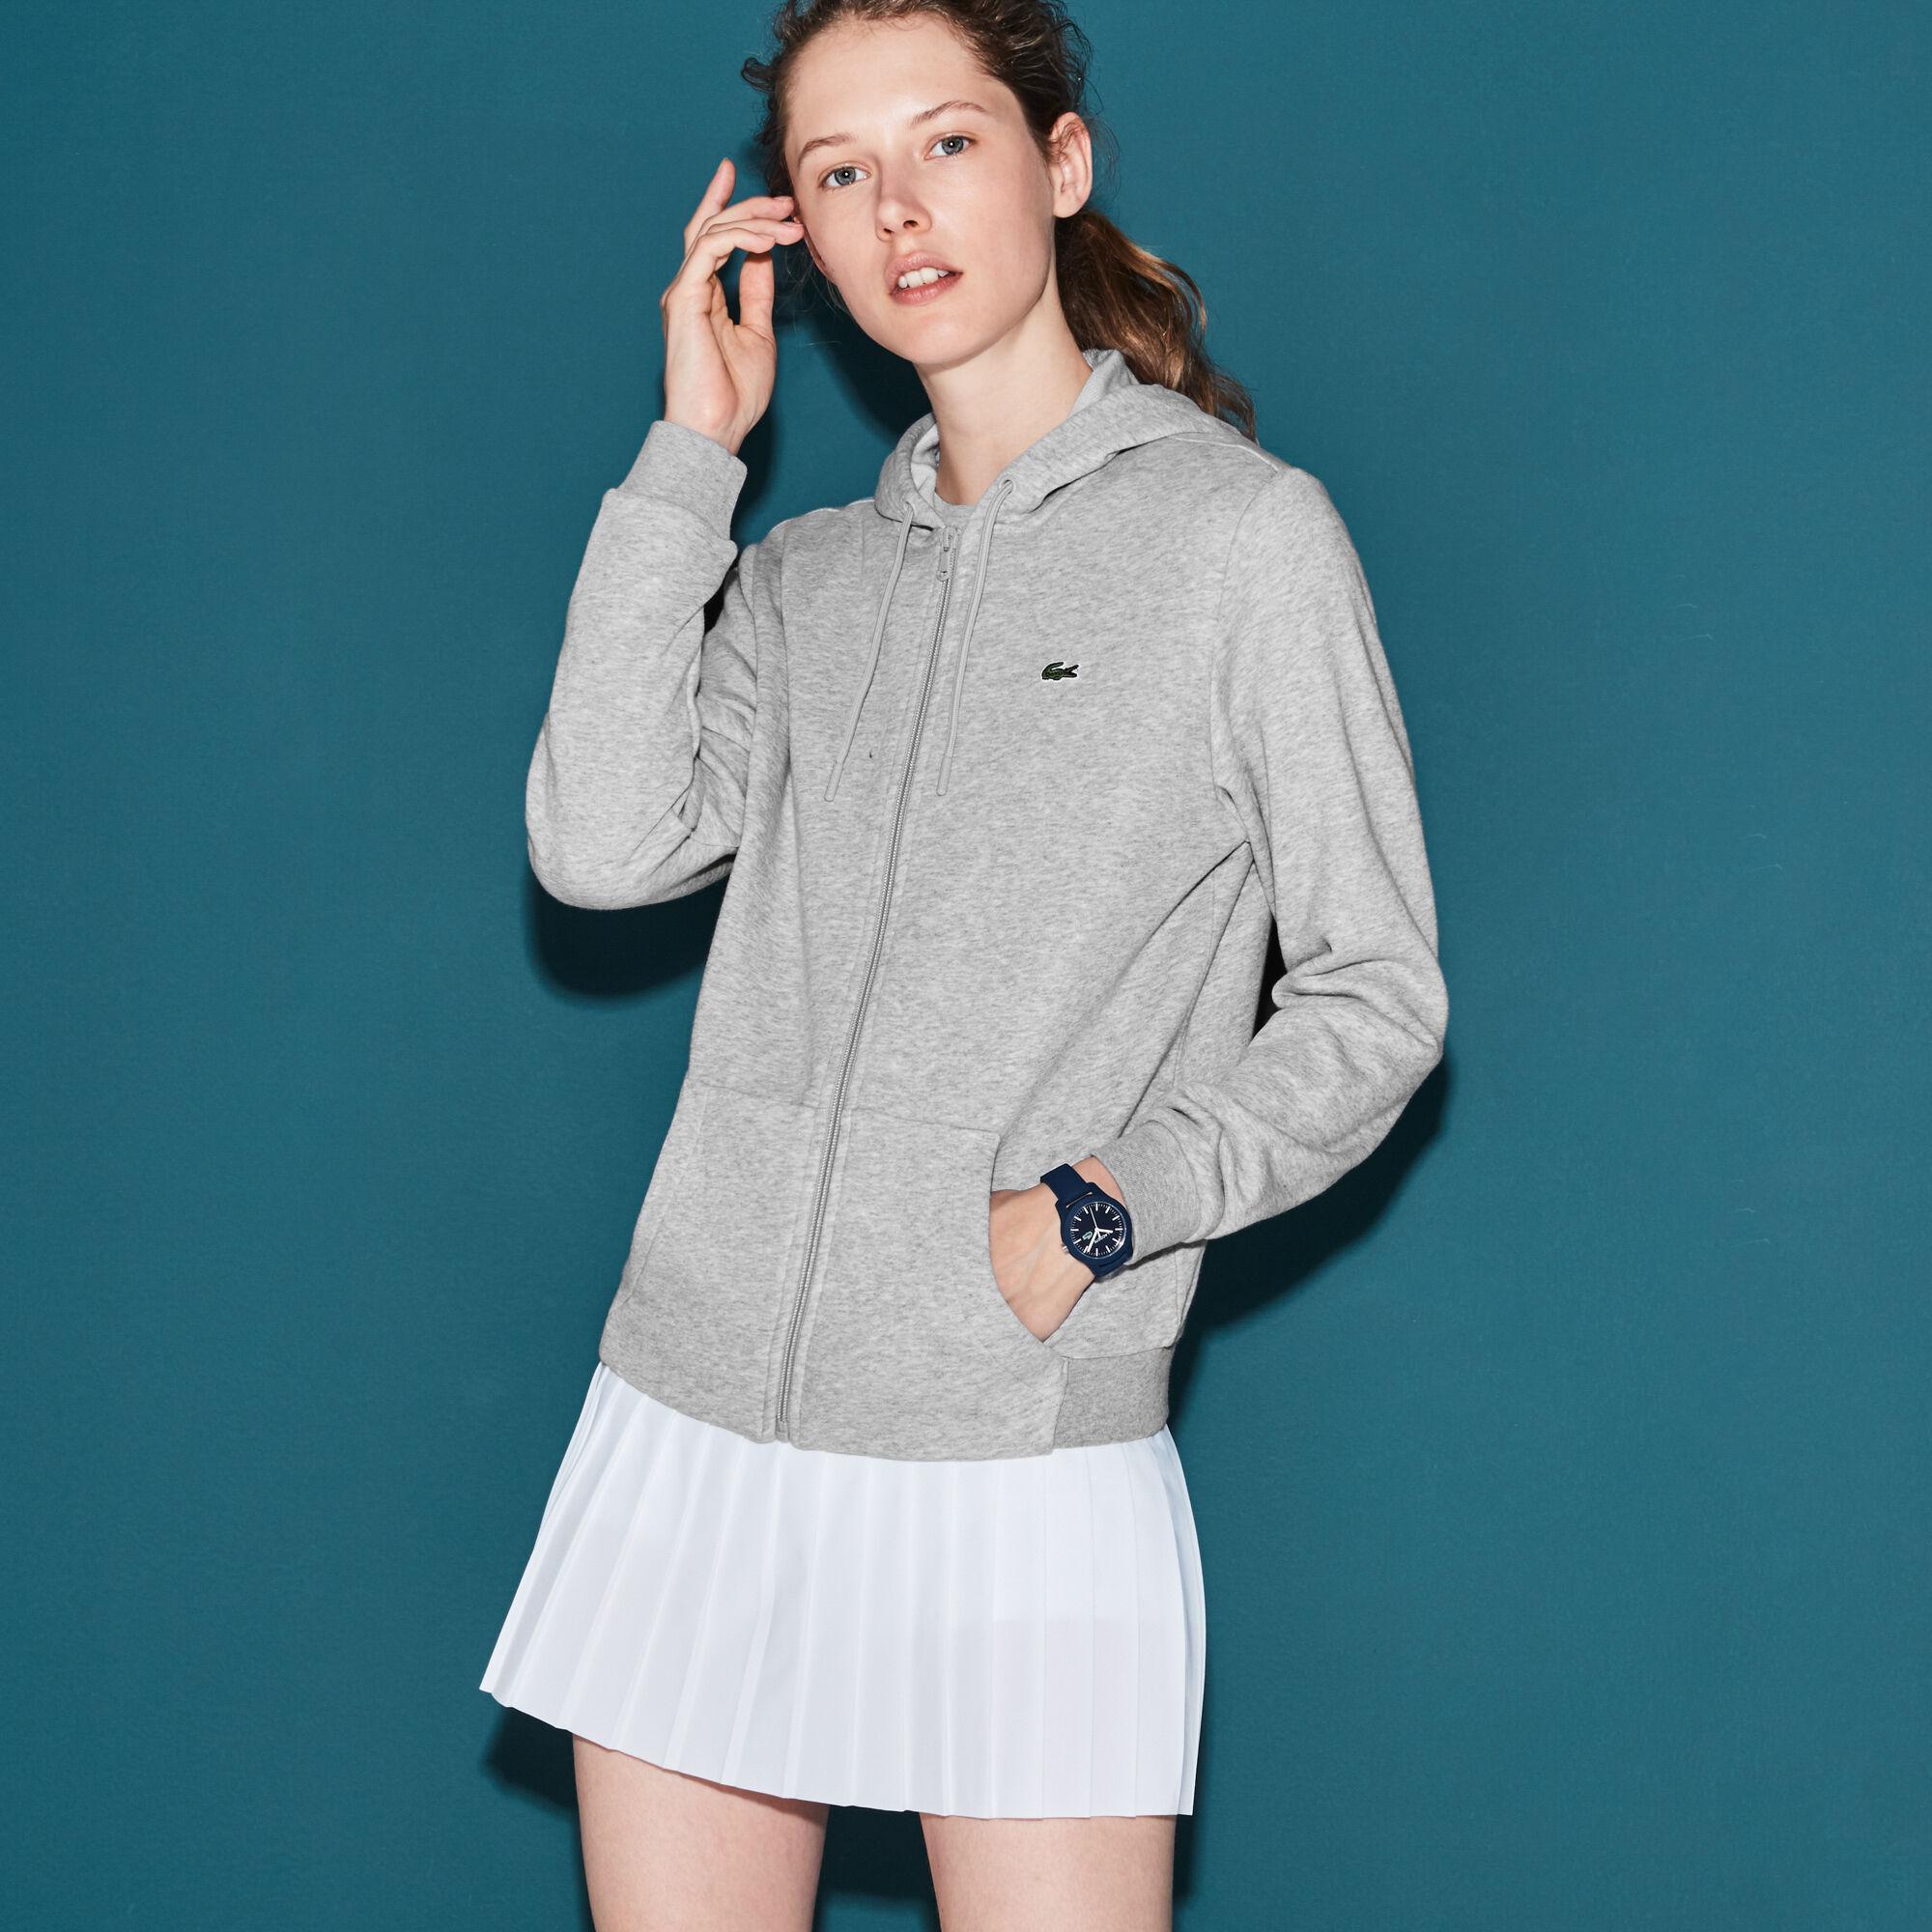 Lacoste Women's Sport Tennis Hooded Zippered Fleece Sweatshirt